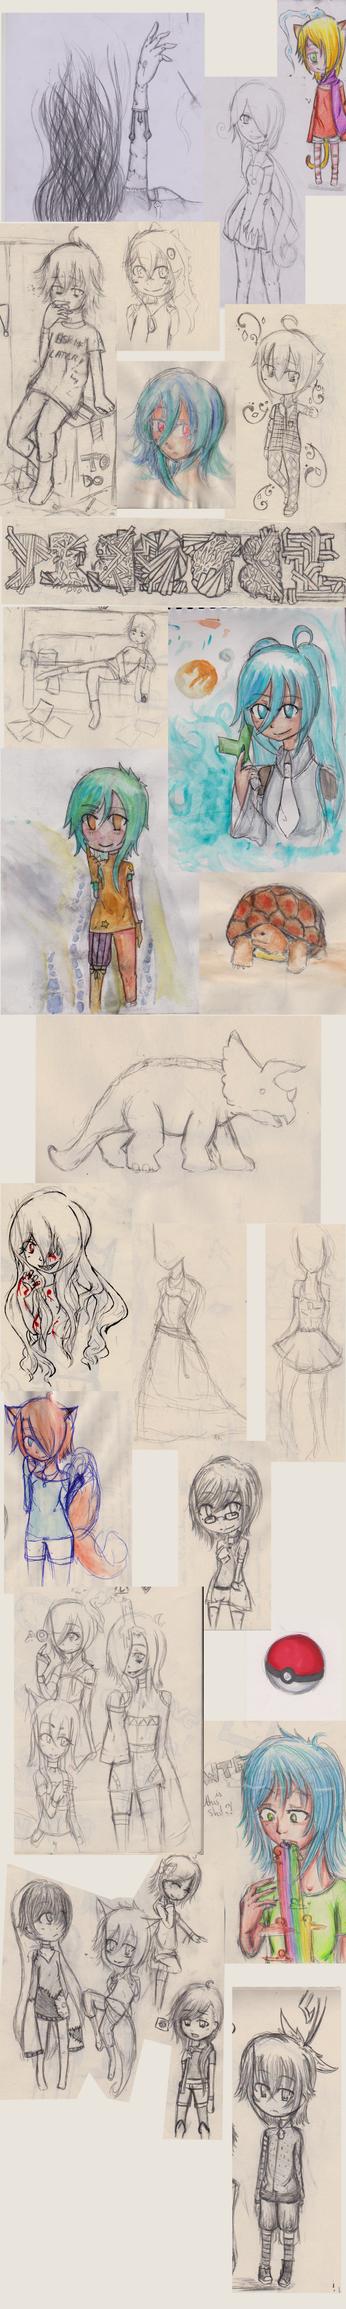 Doodle dump #1 by Kaeradia